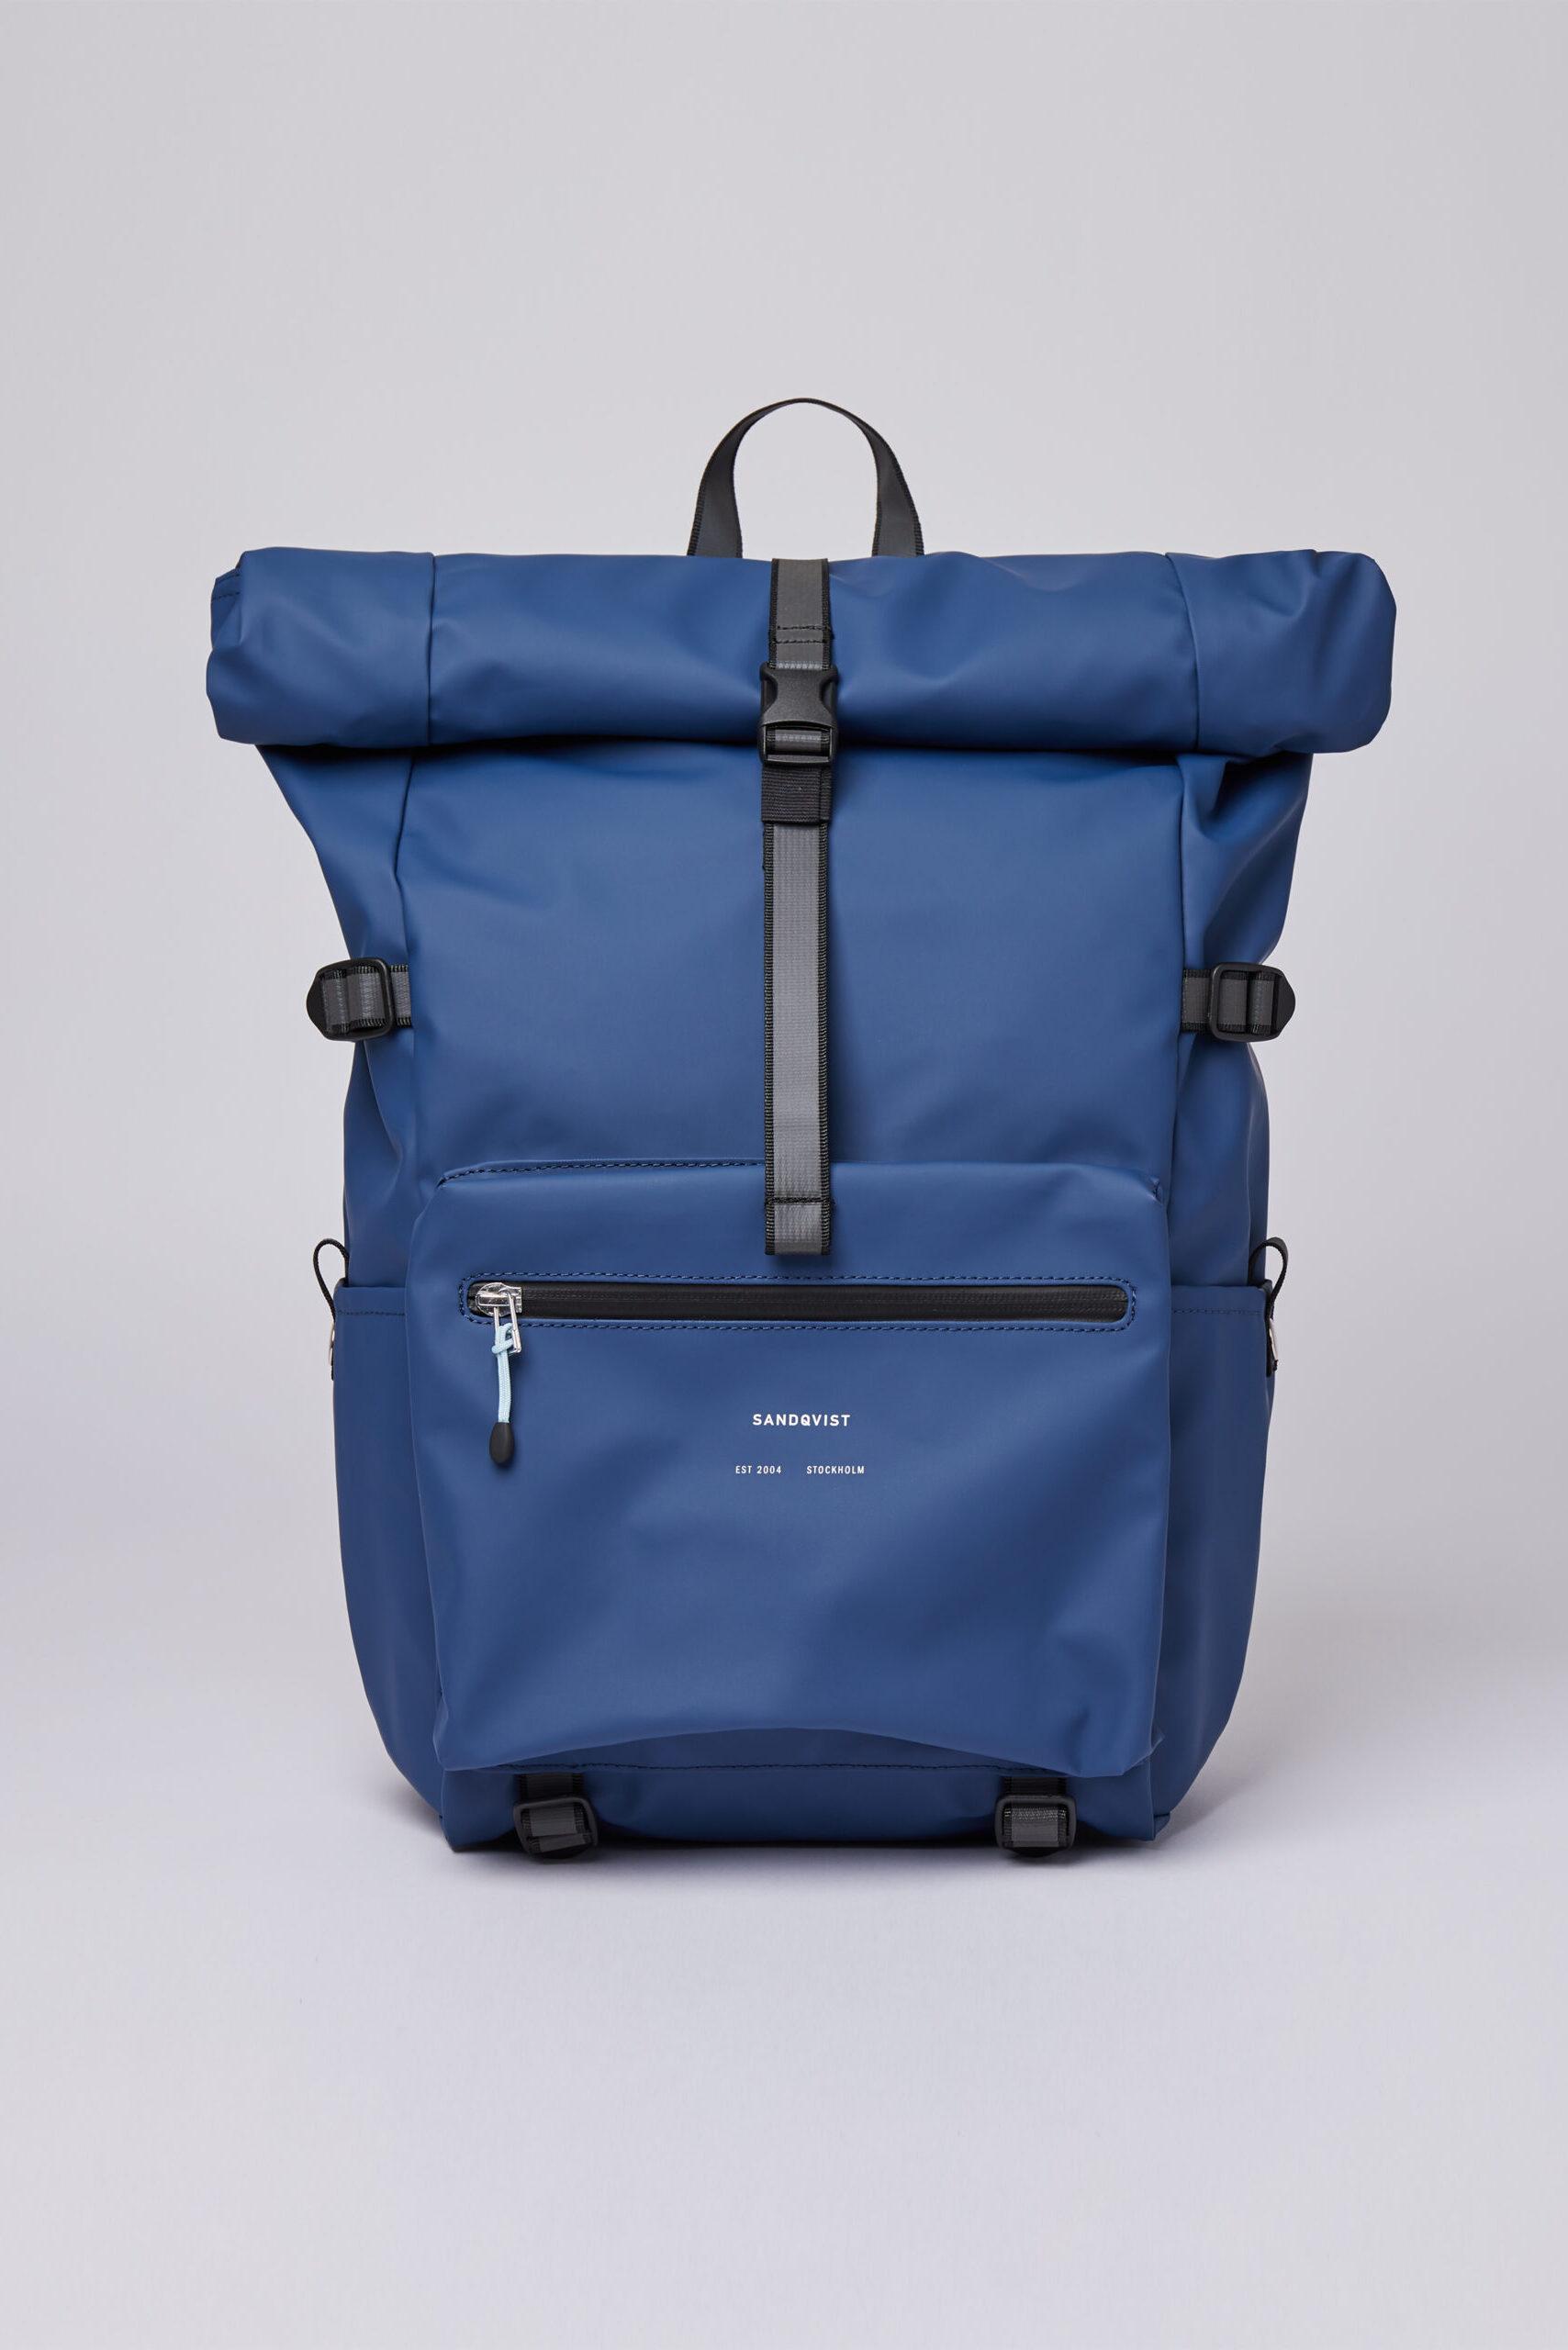 SANDQVIST - Ruben 2.0 blue